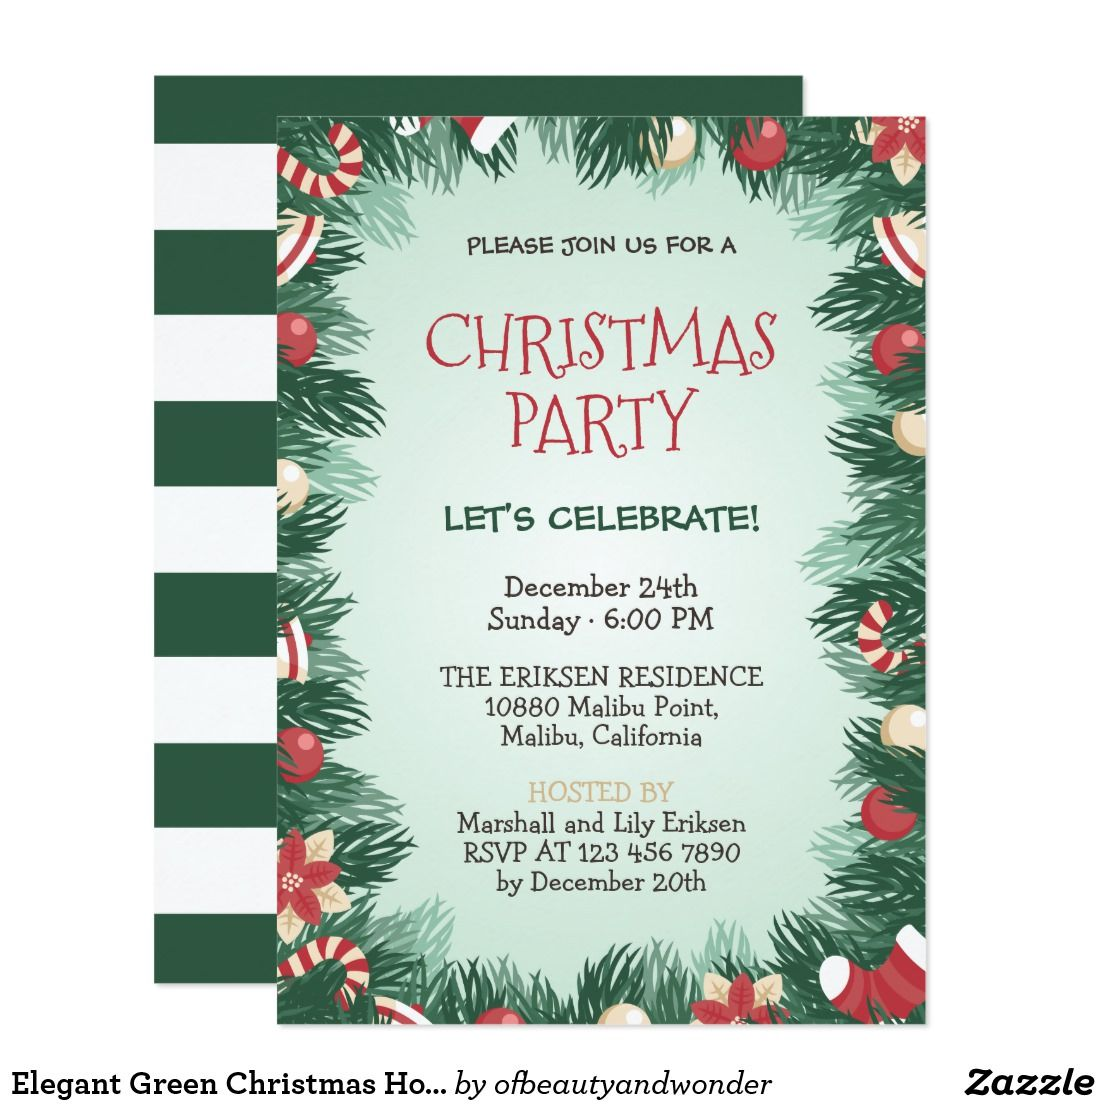 Elegant Green Christmas Holiday Party Invitation